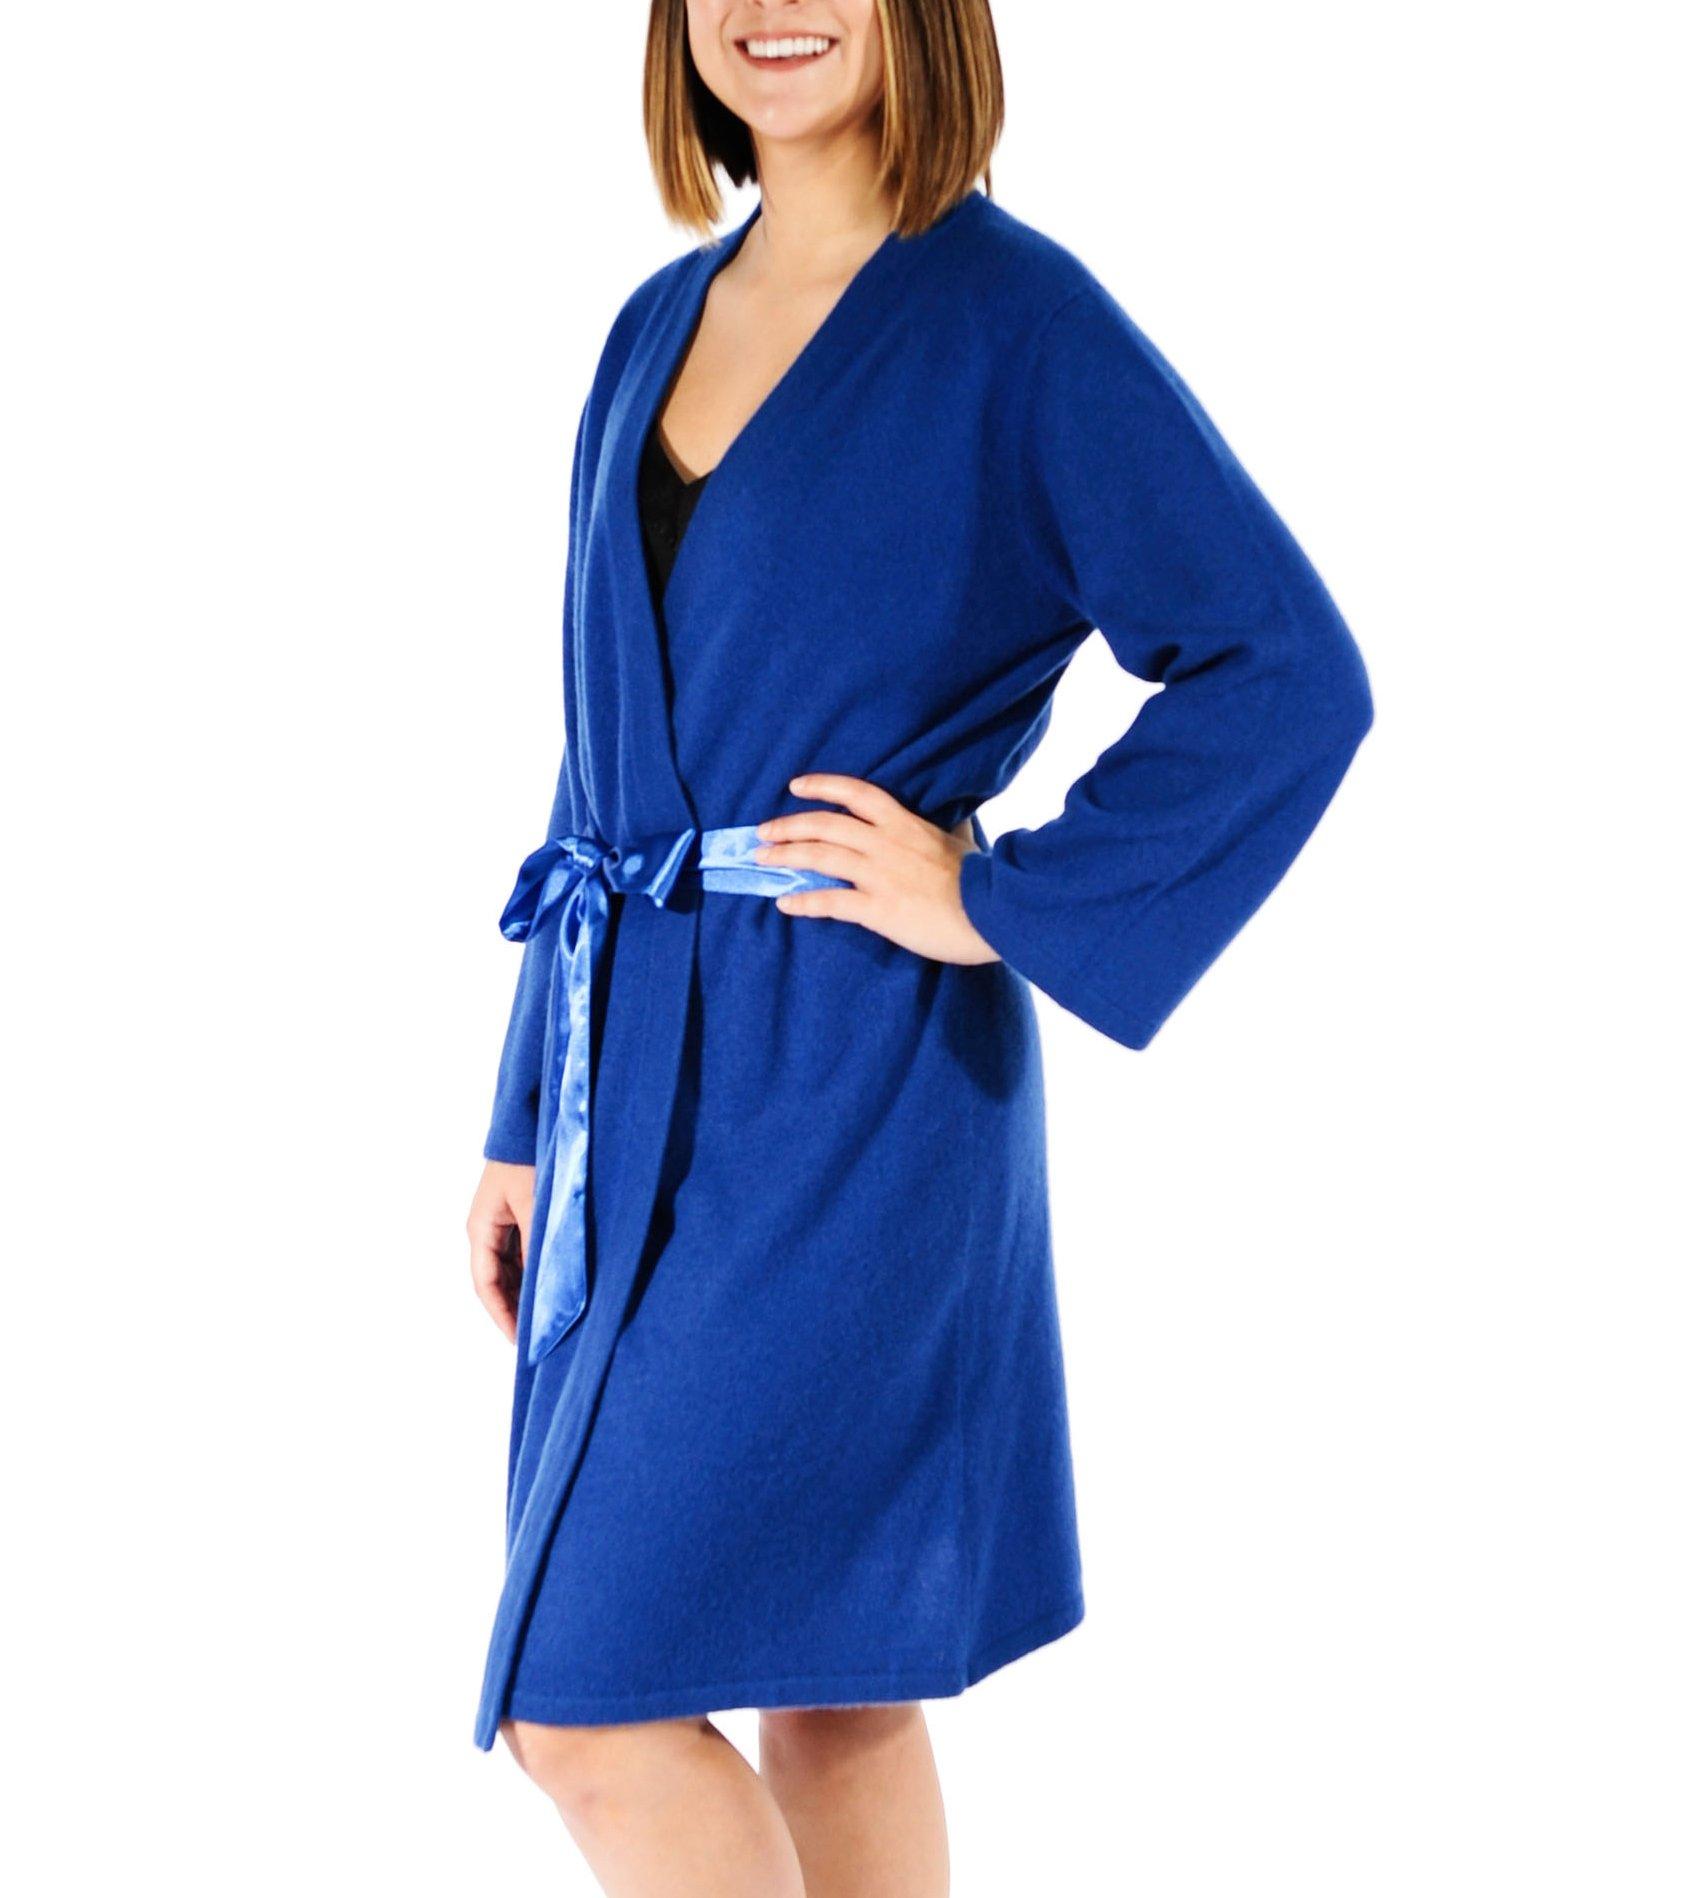 Gigi Reaume 100% Cashmere Women's Robe, Wrap Style, Satin Belt, Short Length (Large, Sapphire Blue)